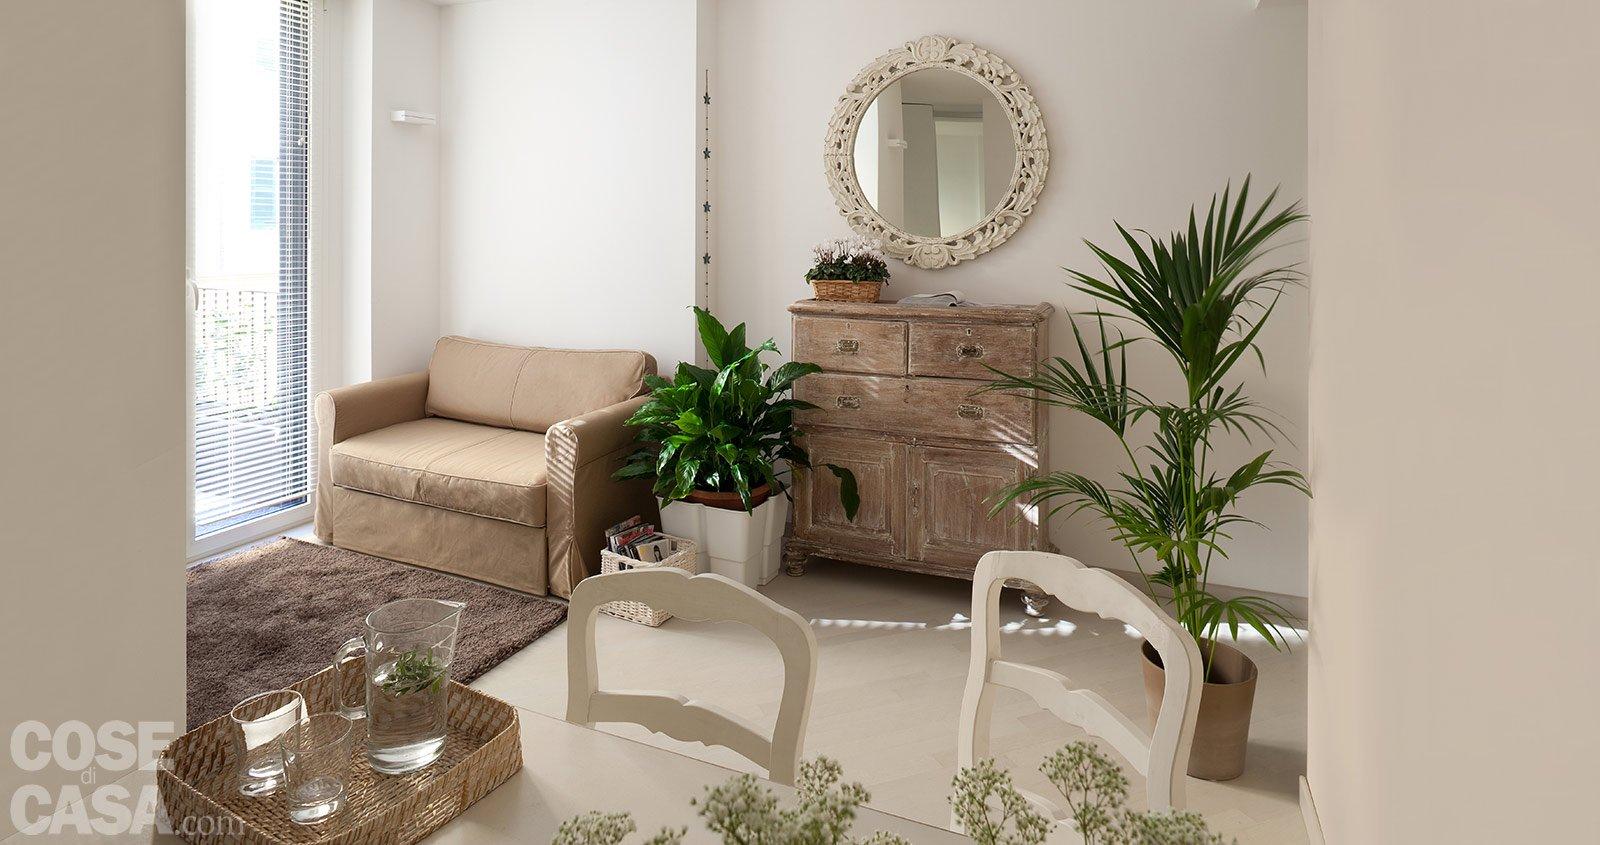 44 mq una stanza in pi in casa cose di casa for Ultimi disegni di mobili foto